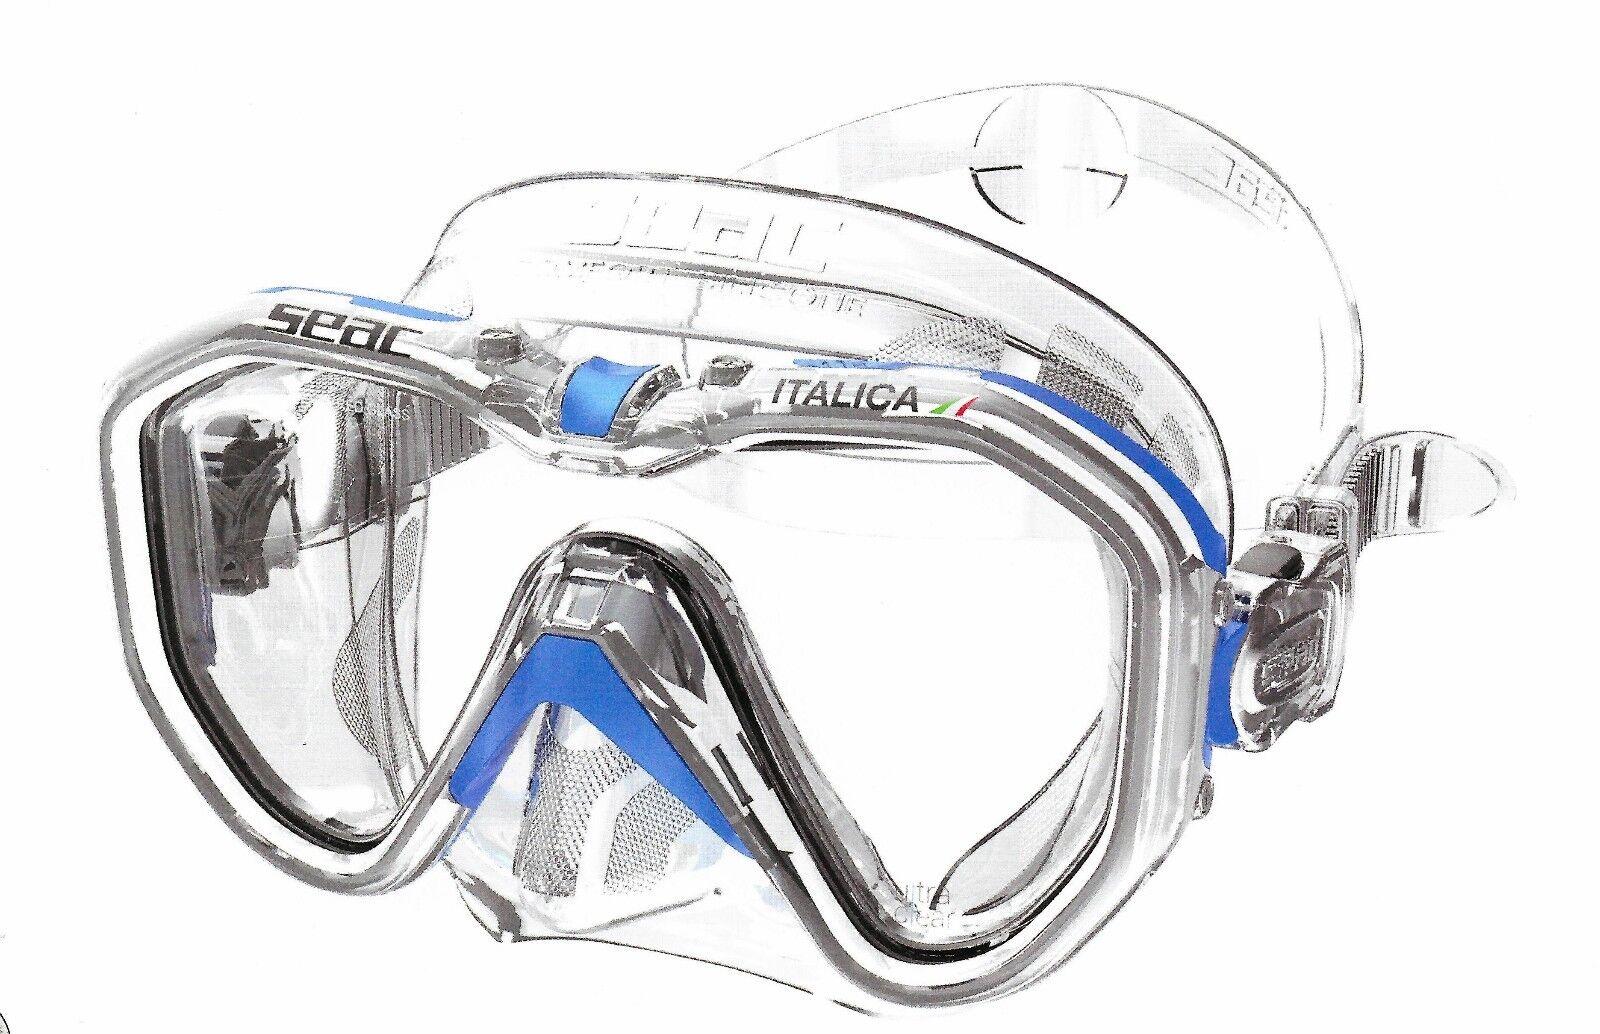 Tauchmaske Taucherbrille 1-Glas  ITALICA ITALICA ITALICA  blau-clear SEACSUB 5ff6ae